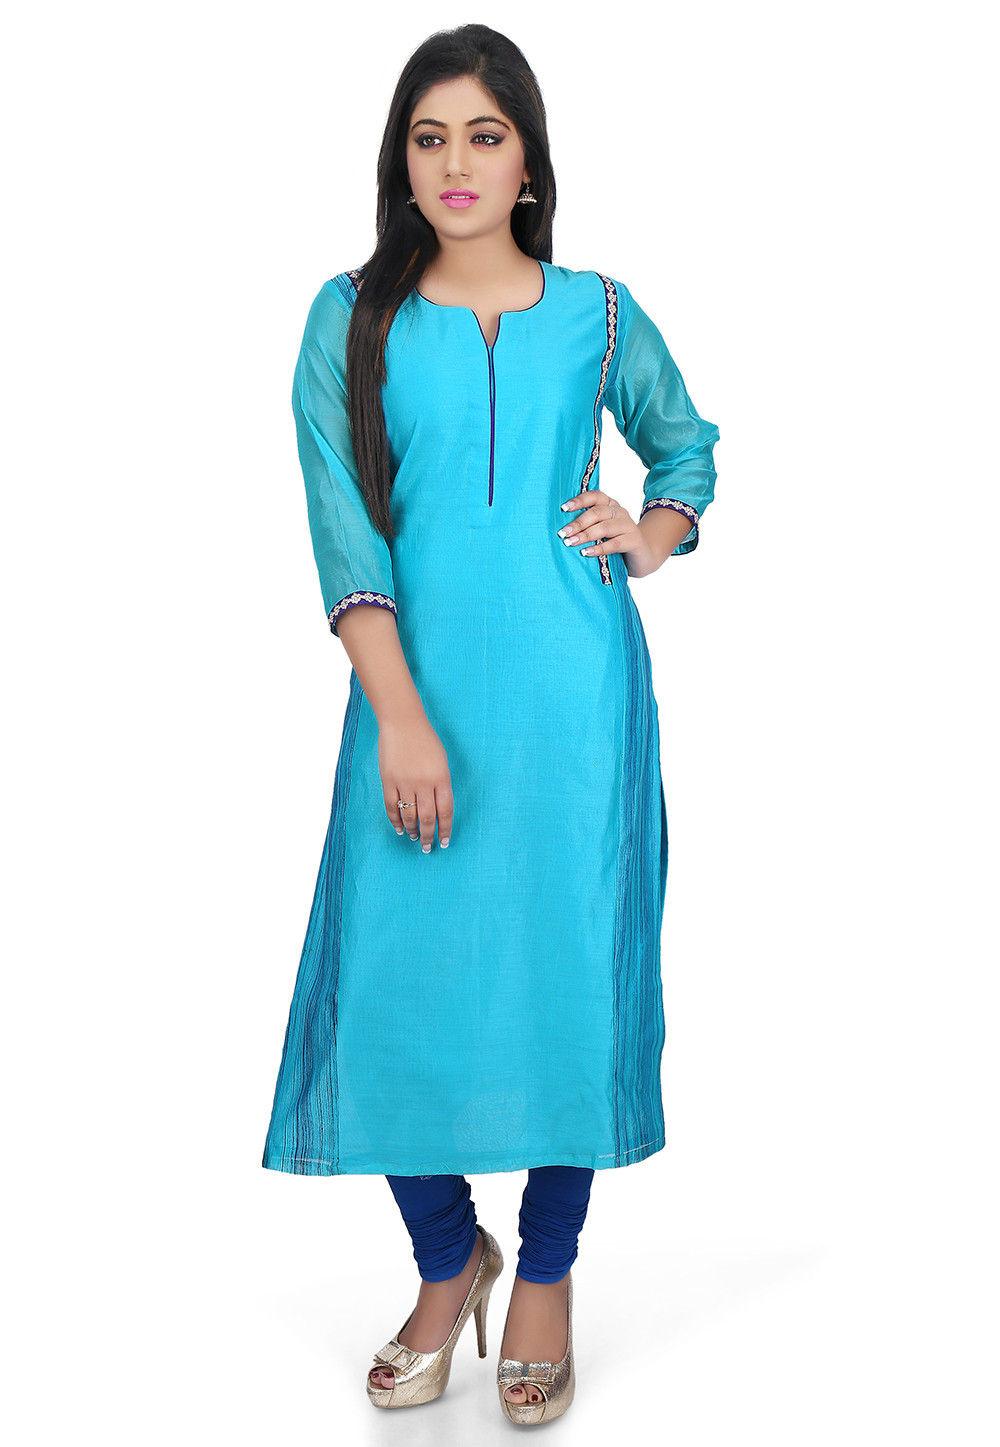 Plain Chanderi Cotton Long Kurta in Teal Blue